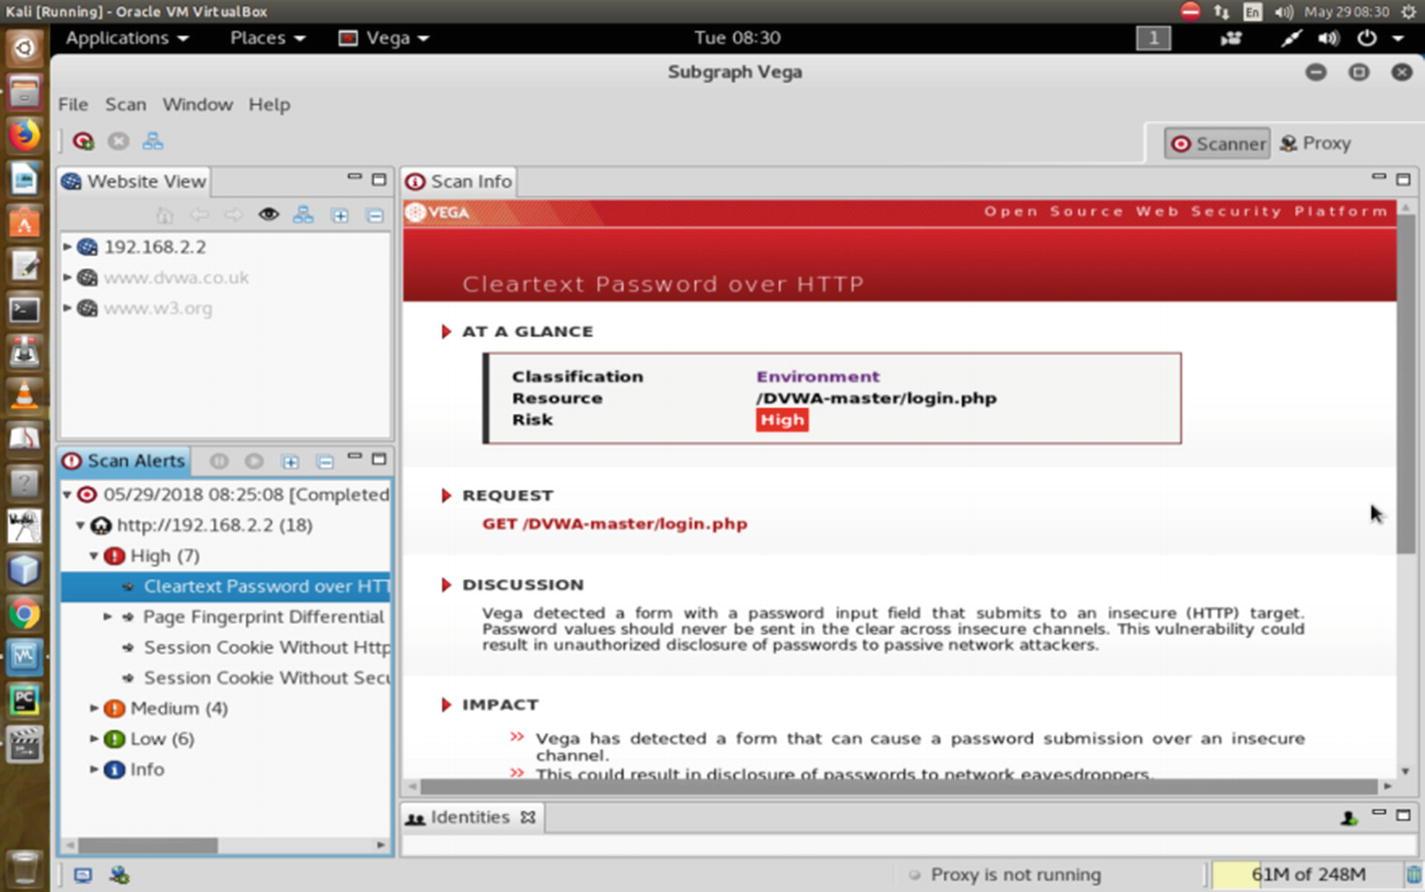 Vulnerability Analysis | SpringerLink